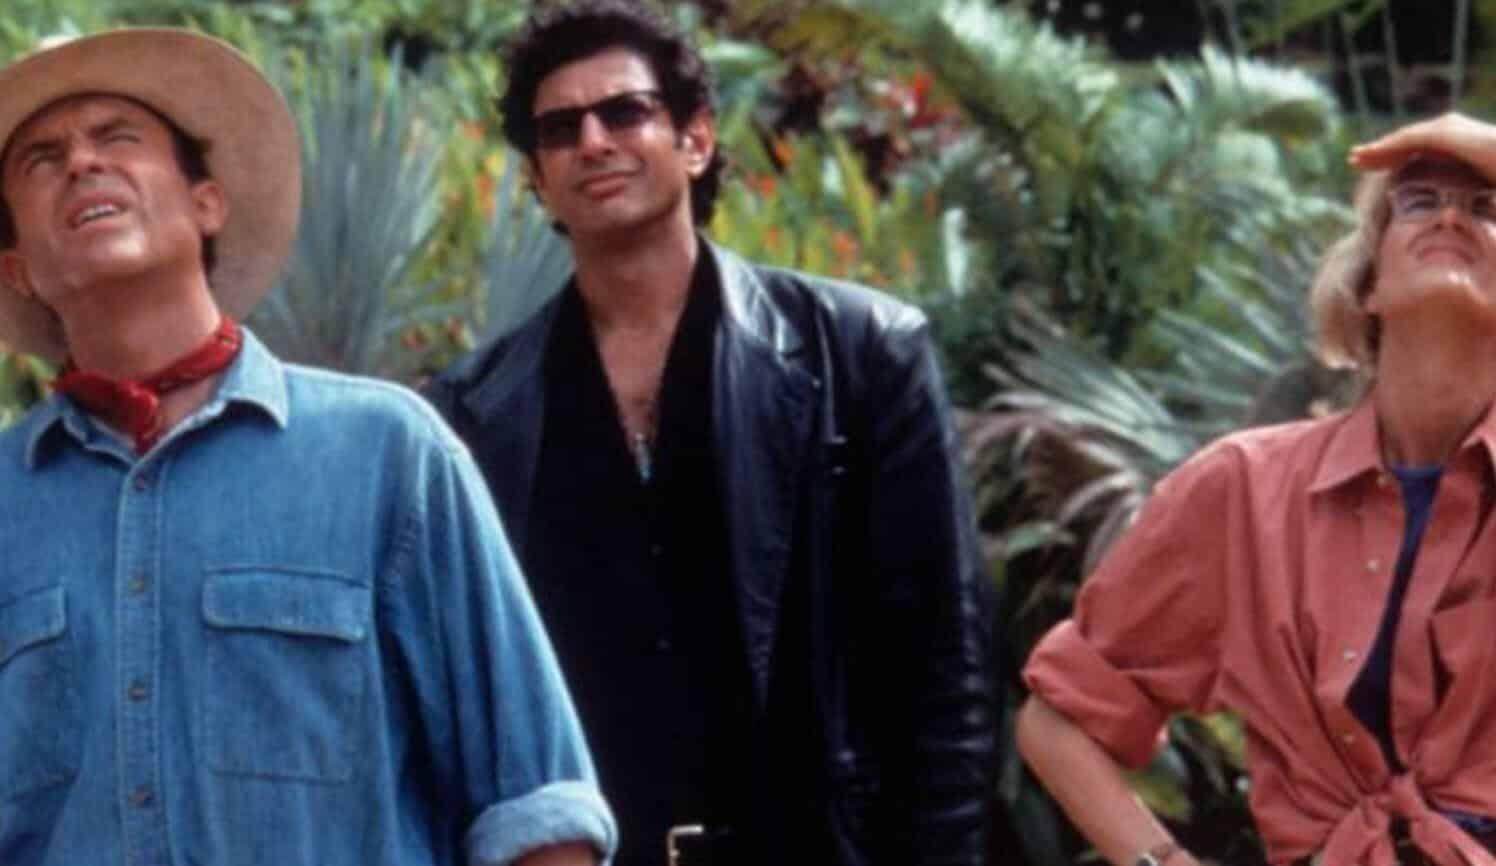 Jurassic World: Dominion cast